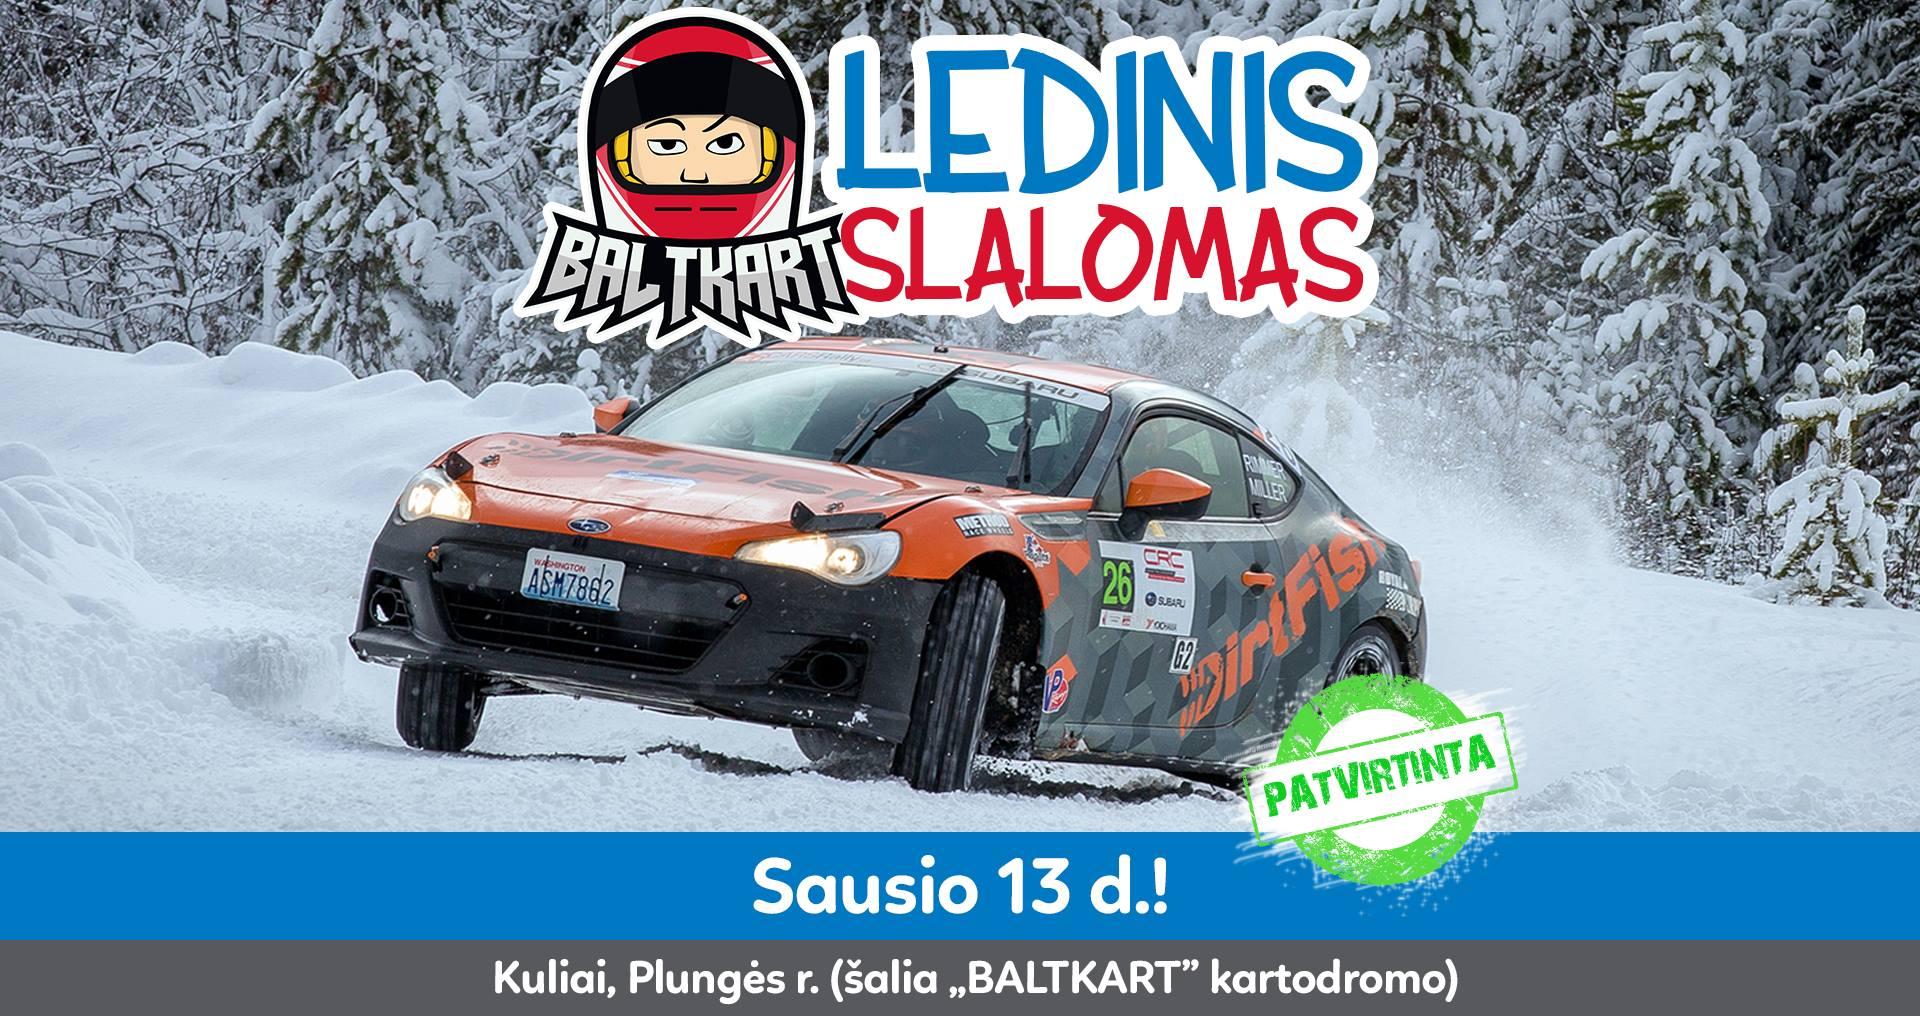 """Baltkart"" Ledinis Slalomas #1!"